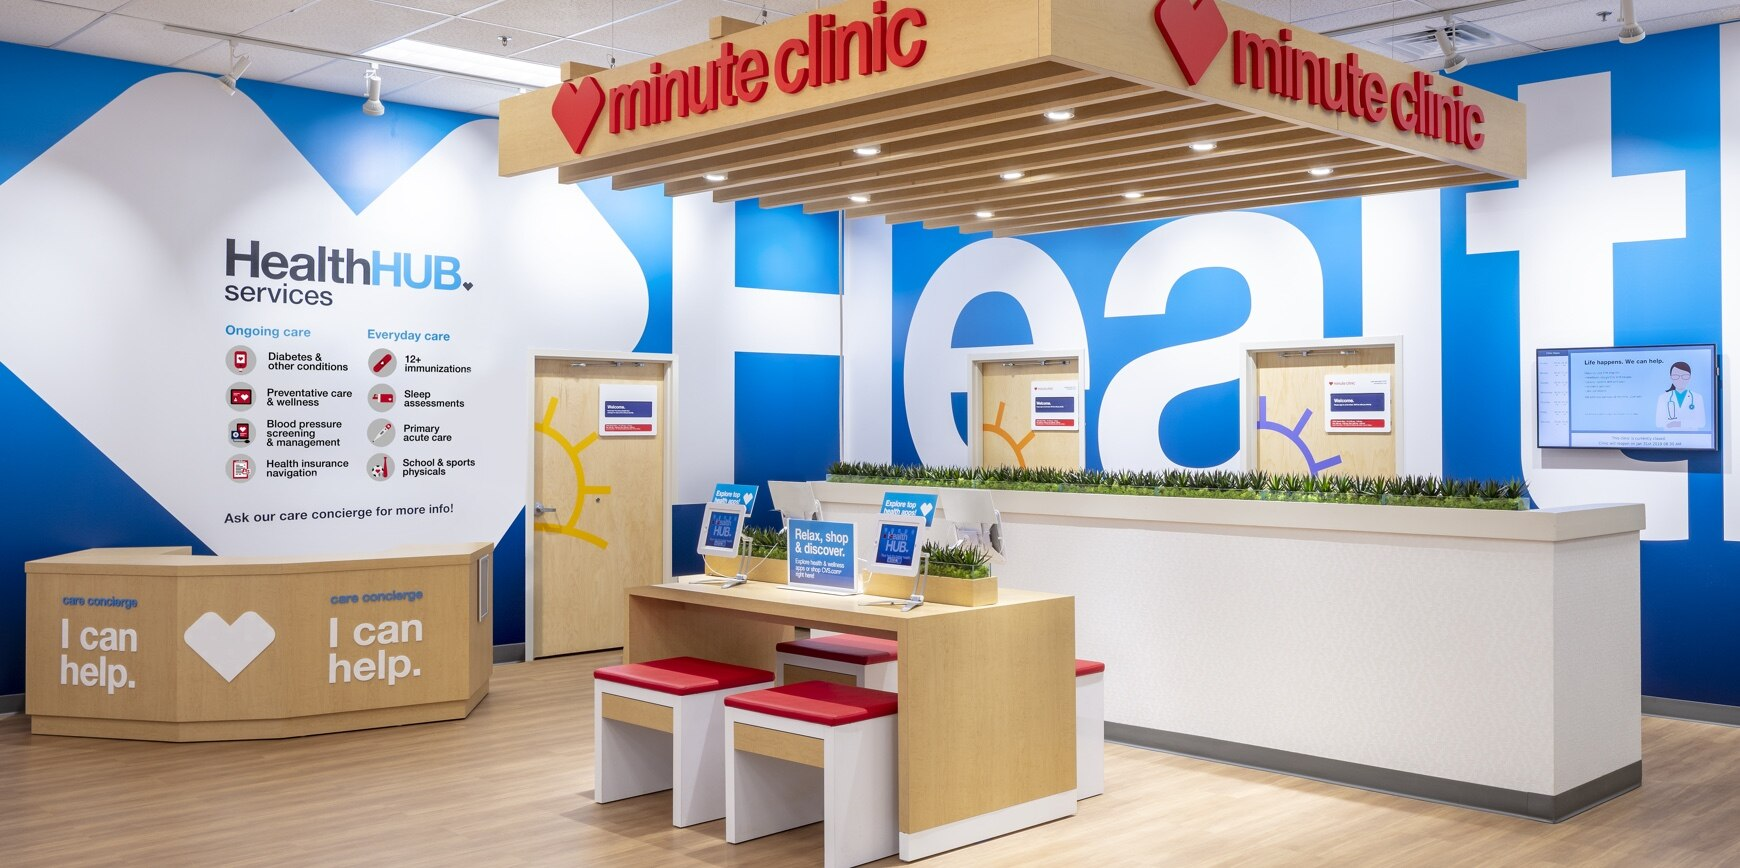 CVS Health Hub Common Area